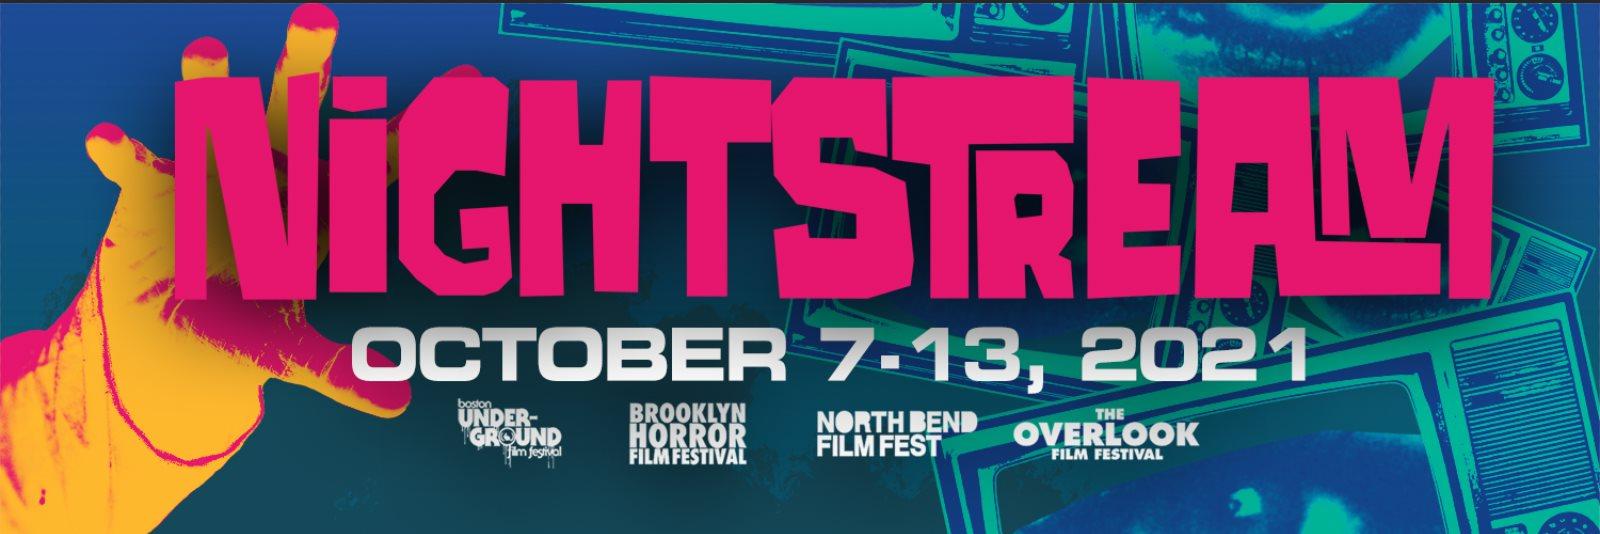 Nightstream 2021 Banner